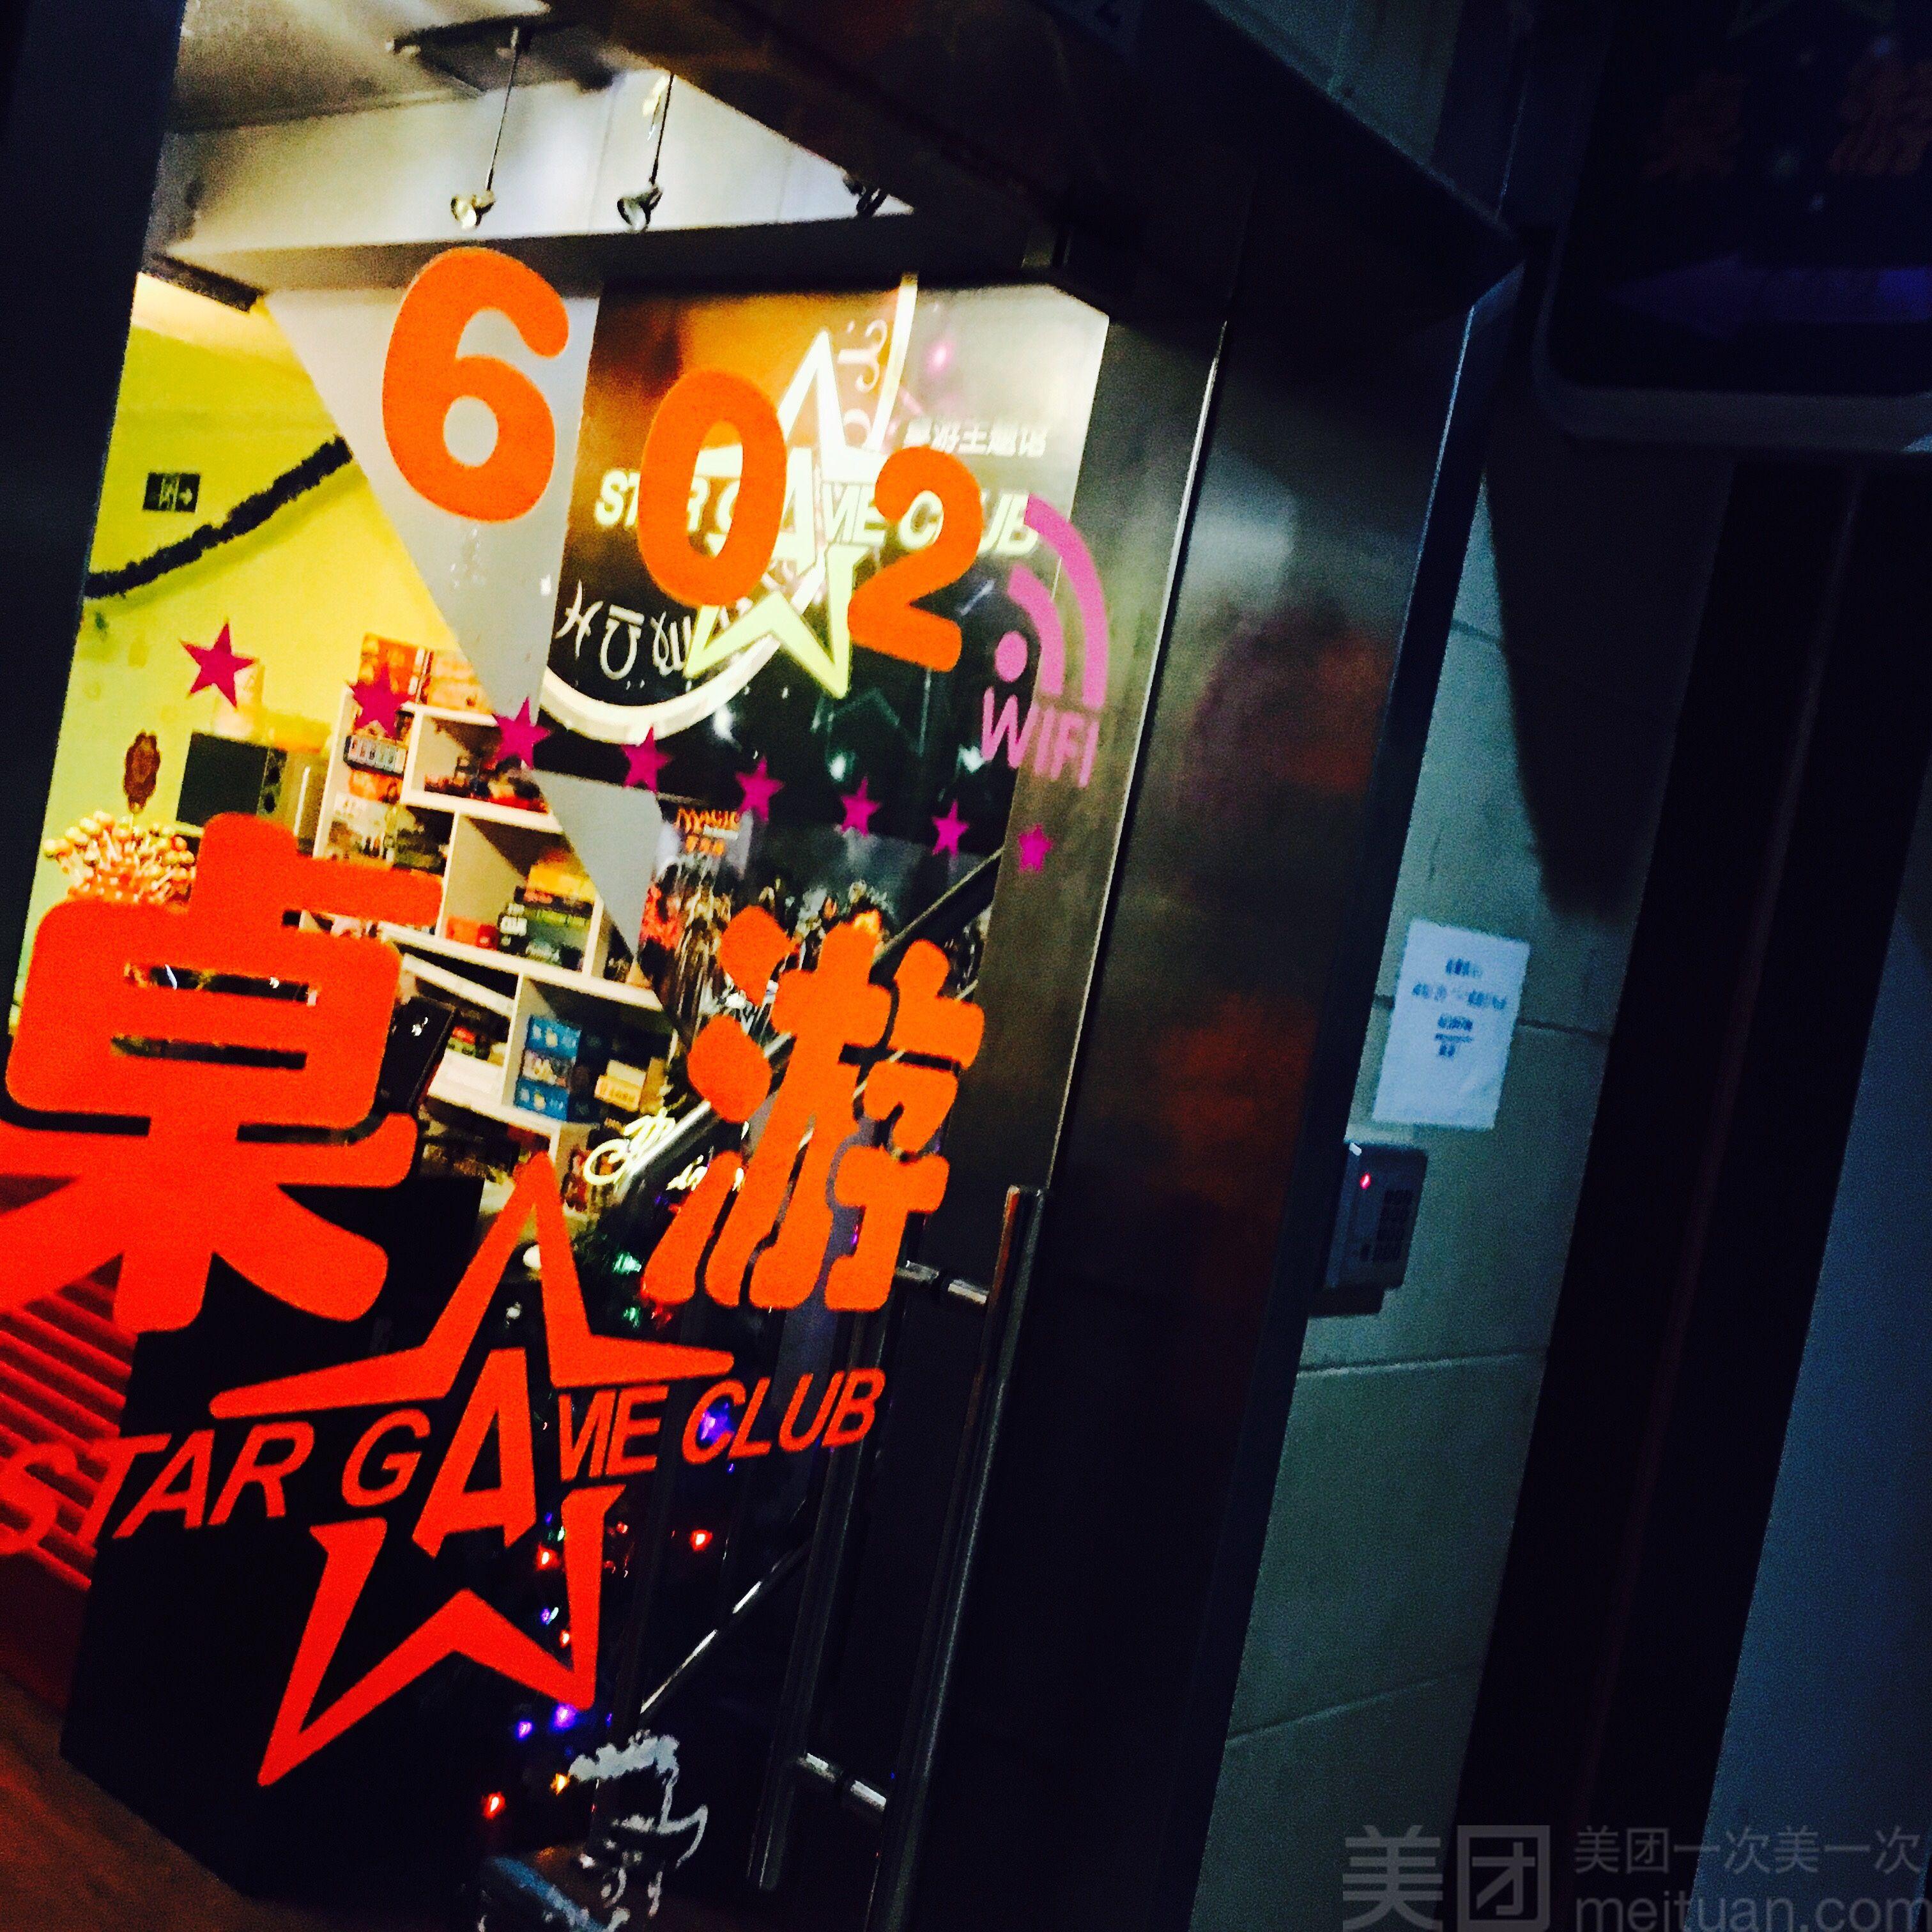 StarGame桌游狼人KTV俱乐部(中山公园棋牌团建轰趴)-美团